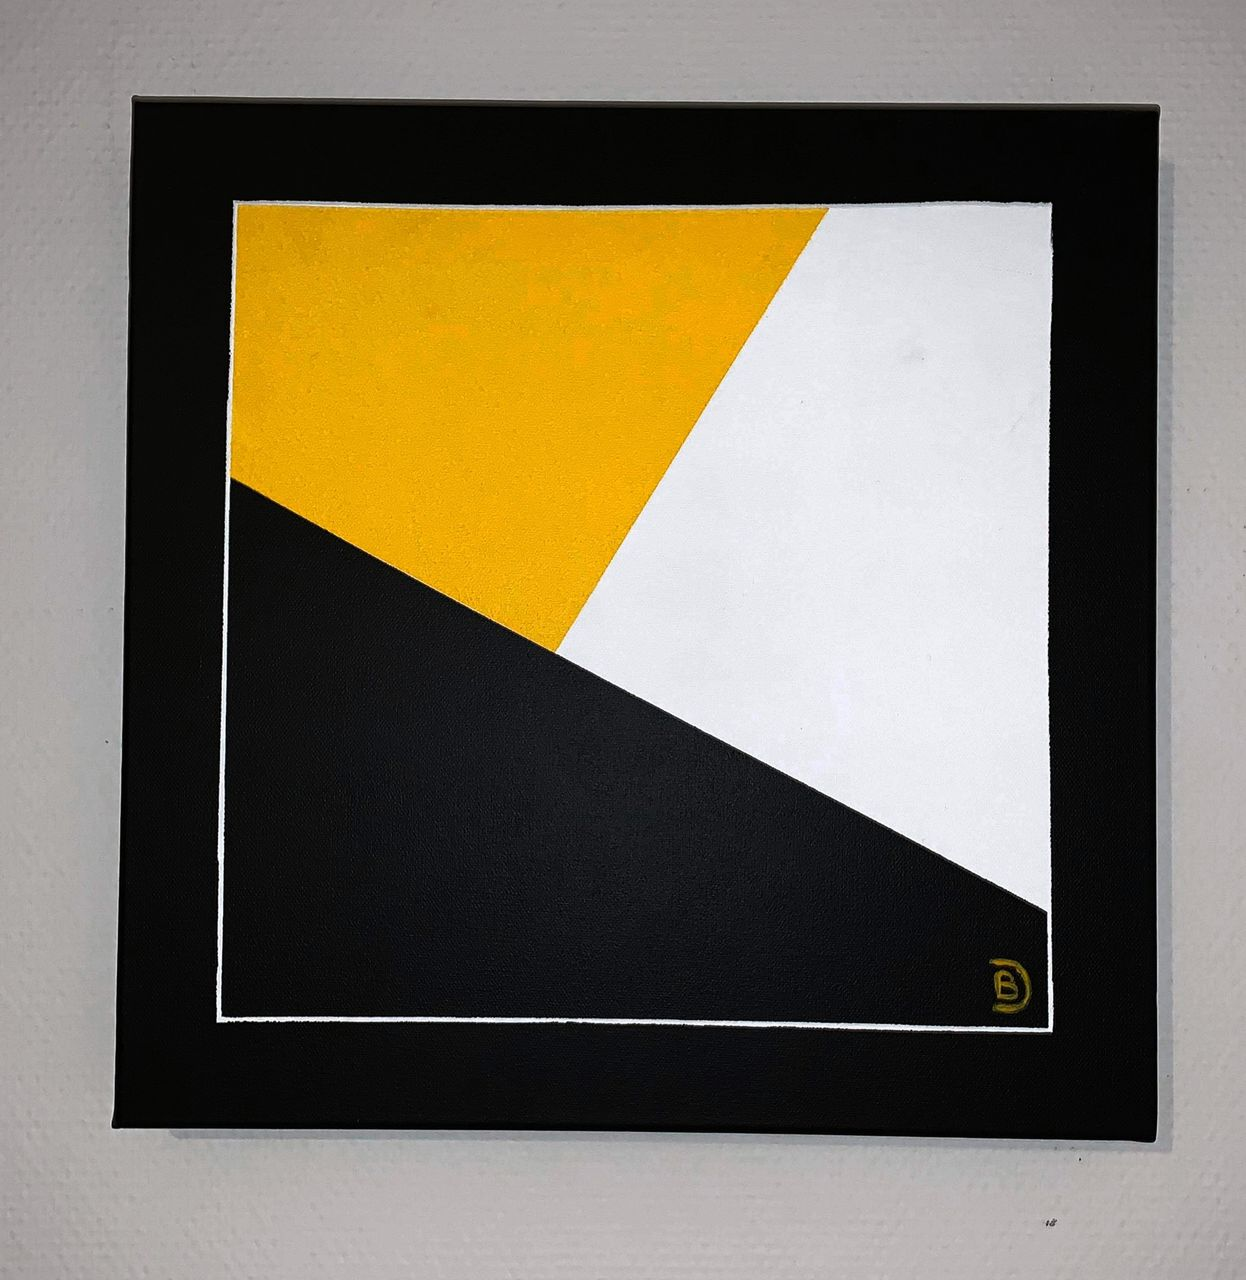 Dominique Balouet Art 20181230_184545